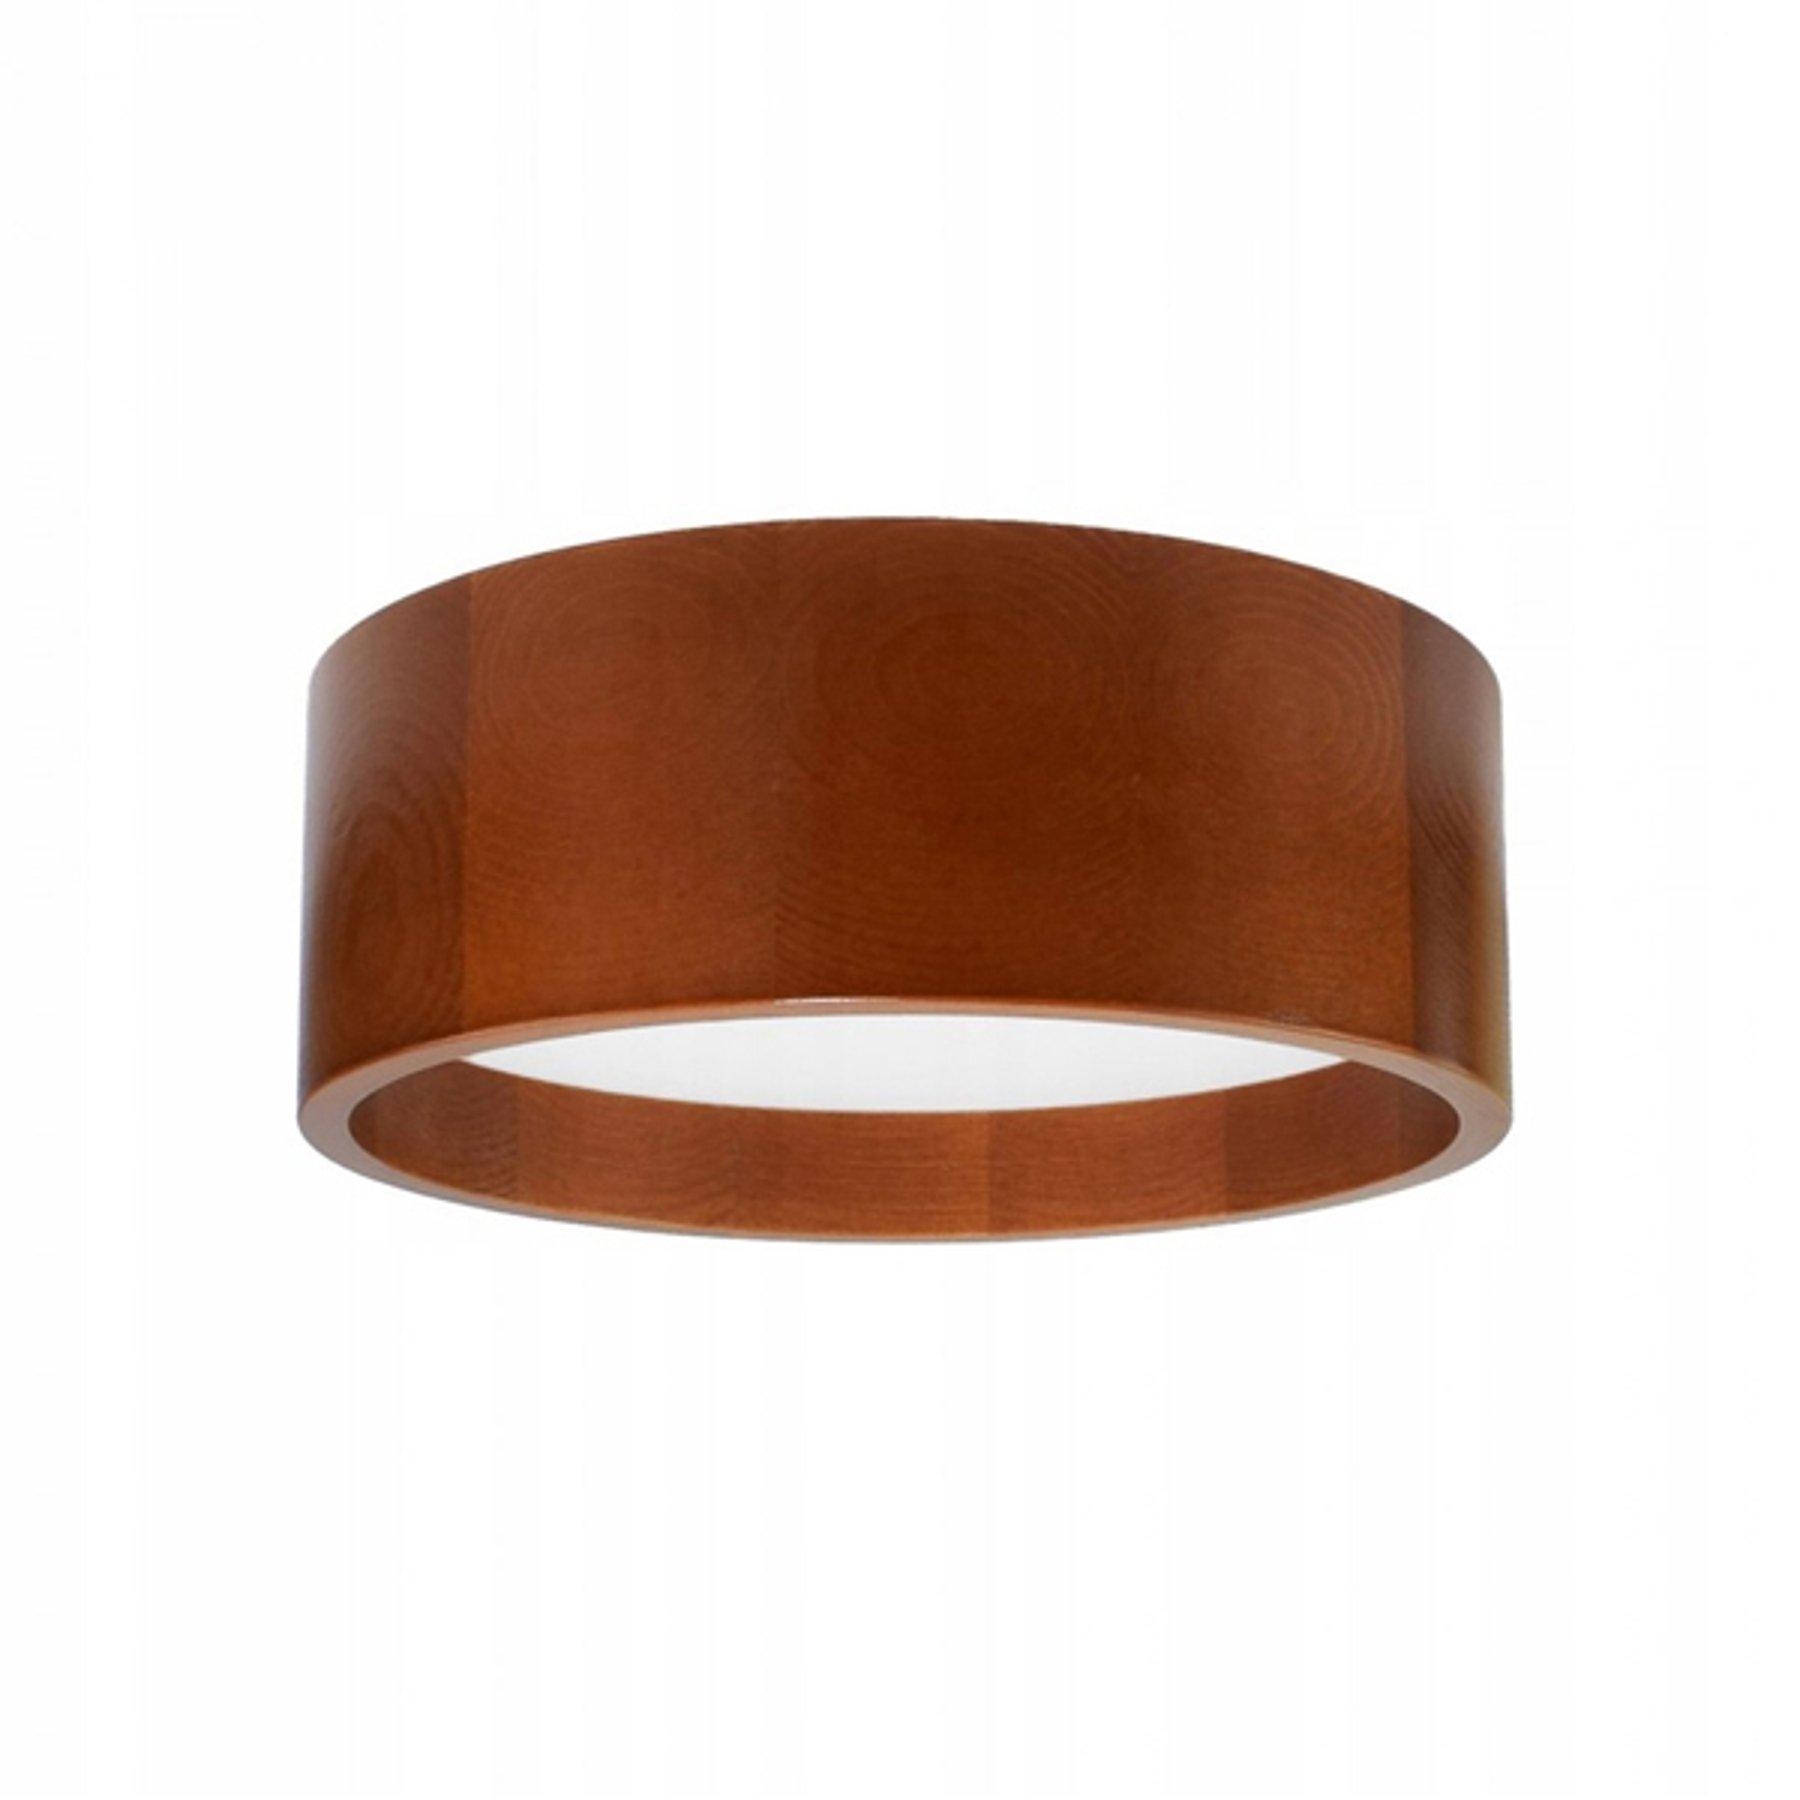 LED-taklampe Deep, Ø 28 cm, brun